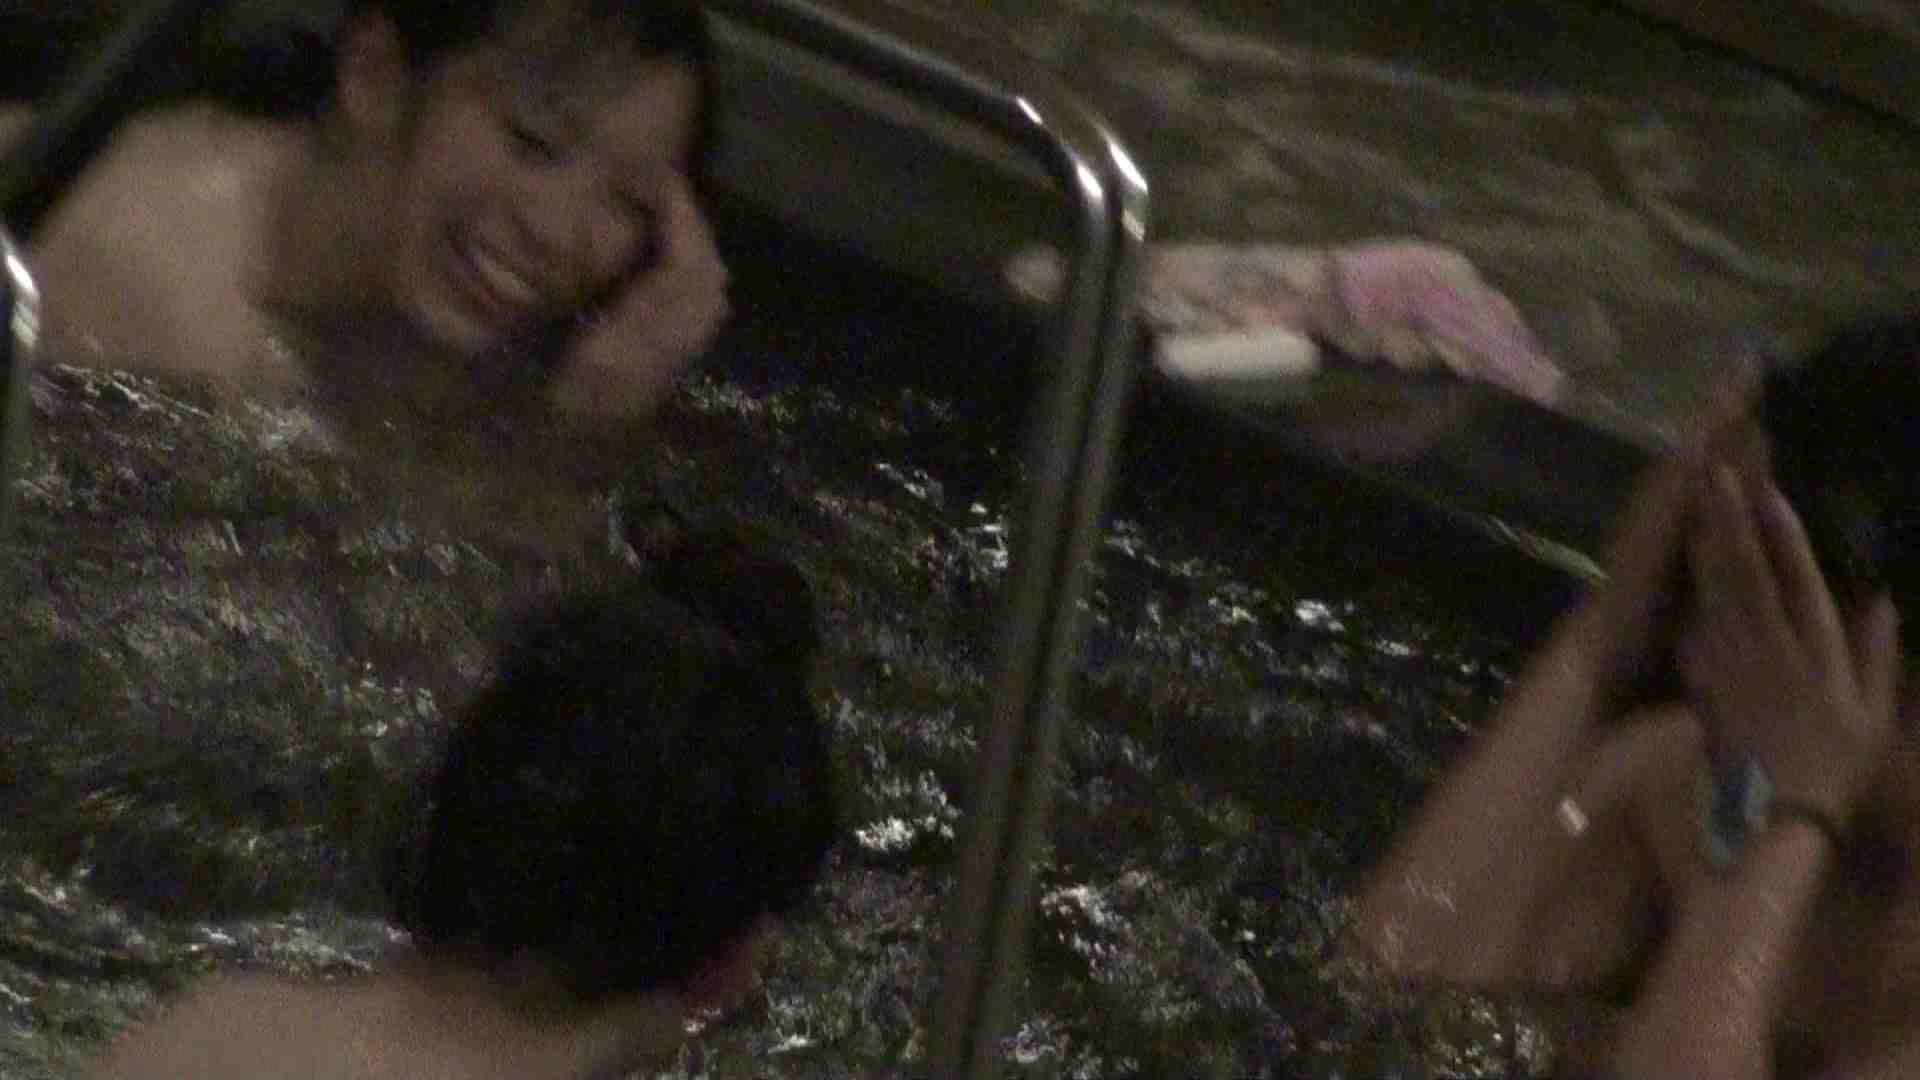 Aquaな露天風呂Vol.383 露天 オマンコ無修正動画無料 79連発 79